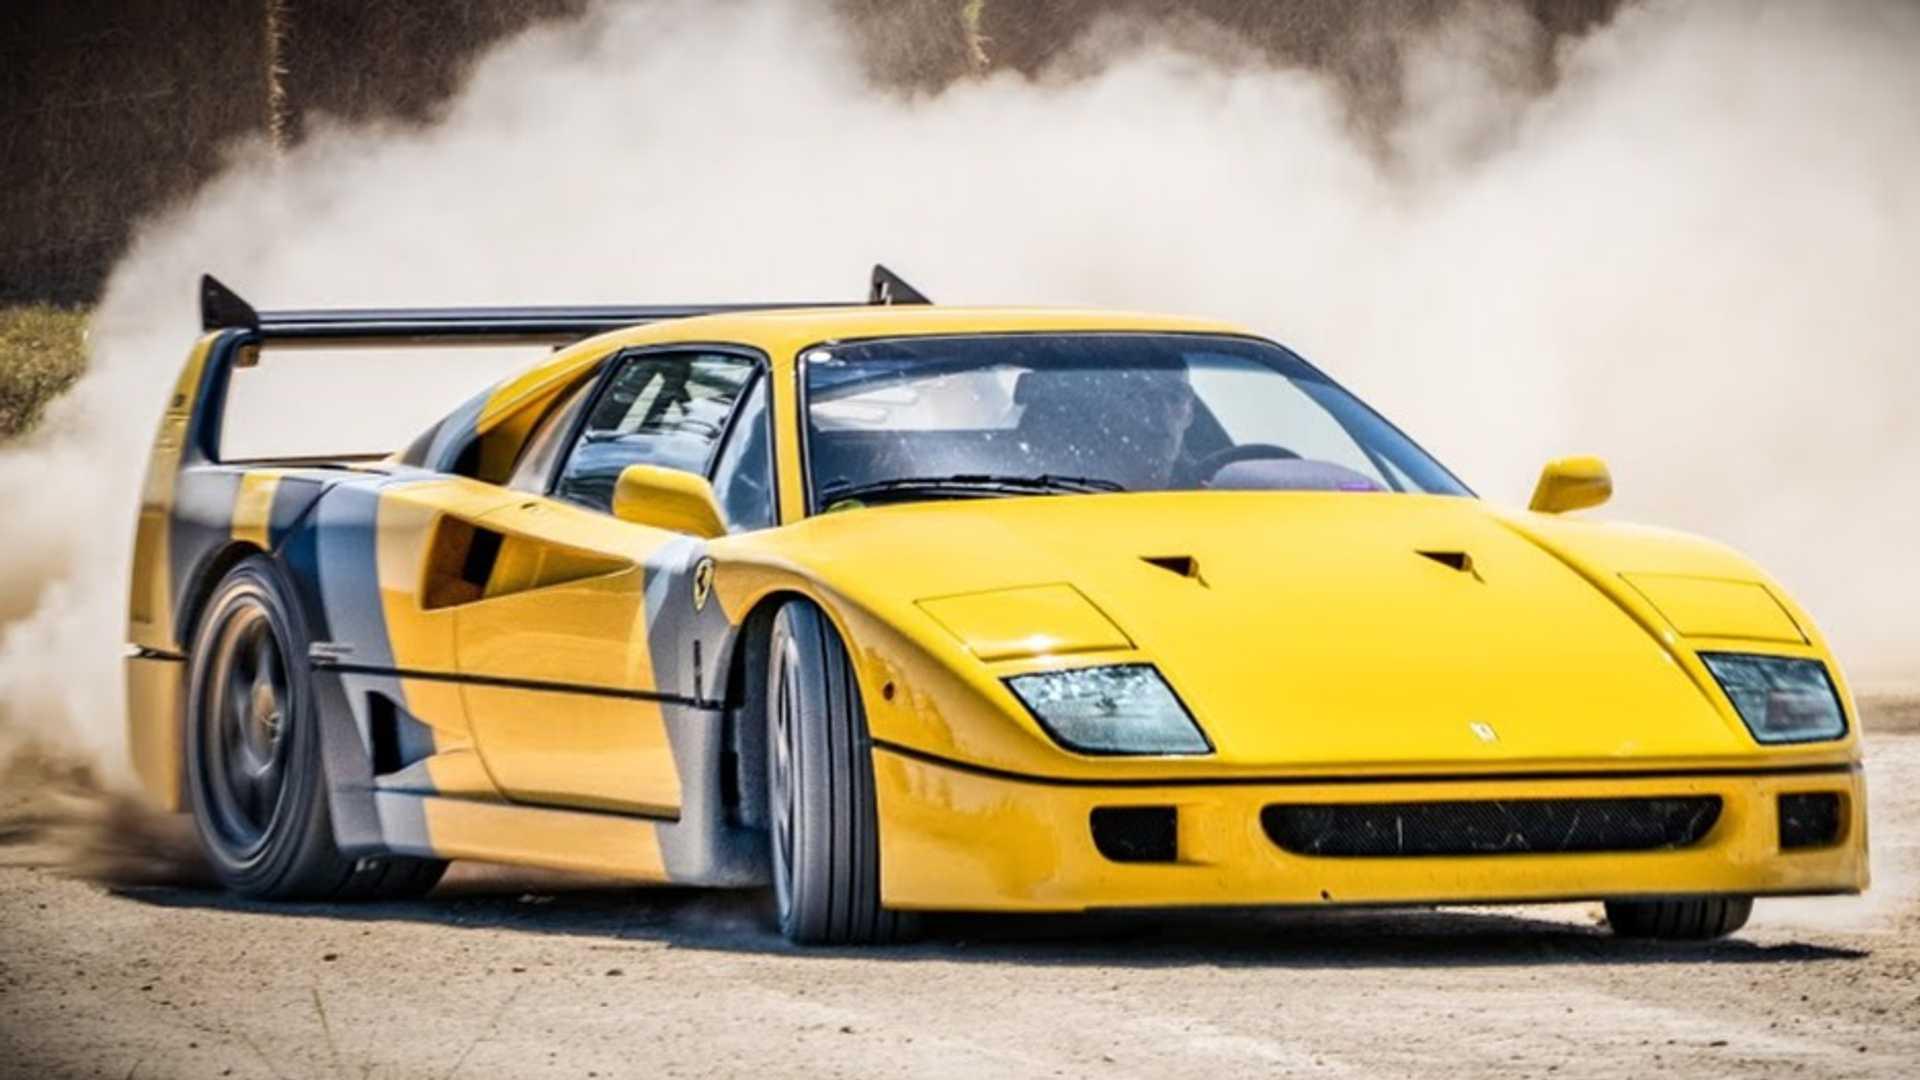 Ferrari F40 Trashed Around A Dirt Course Looks Like A Real Hoot